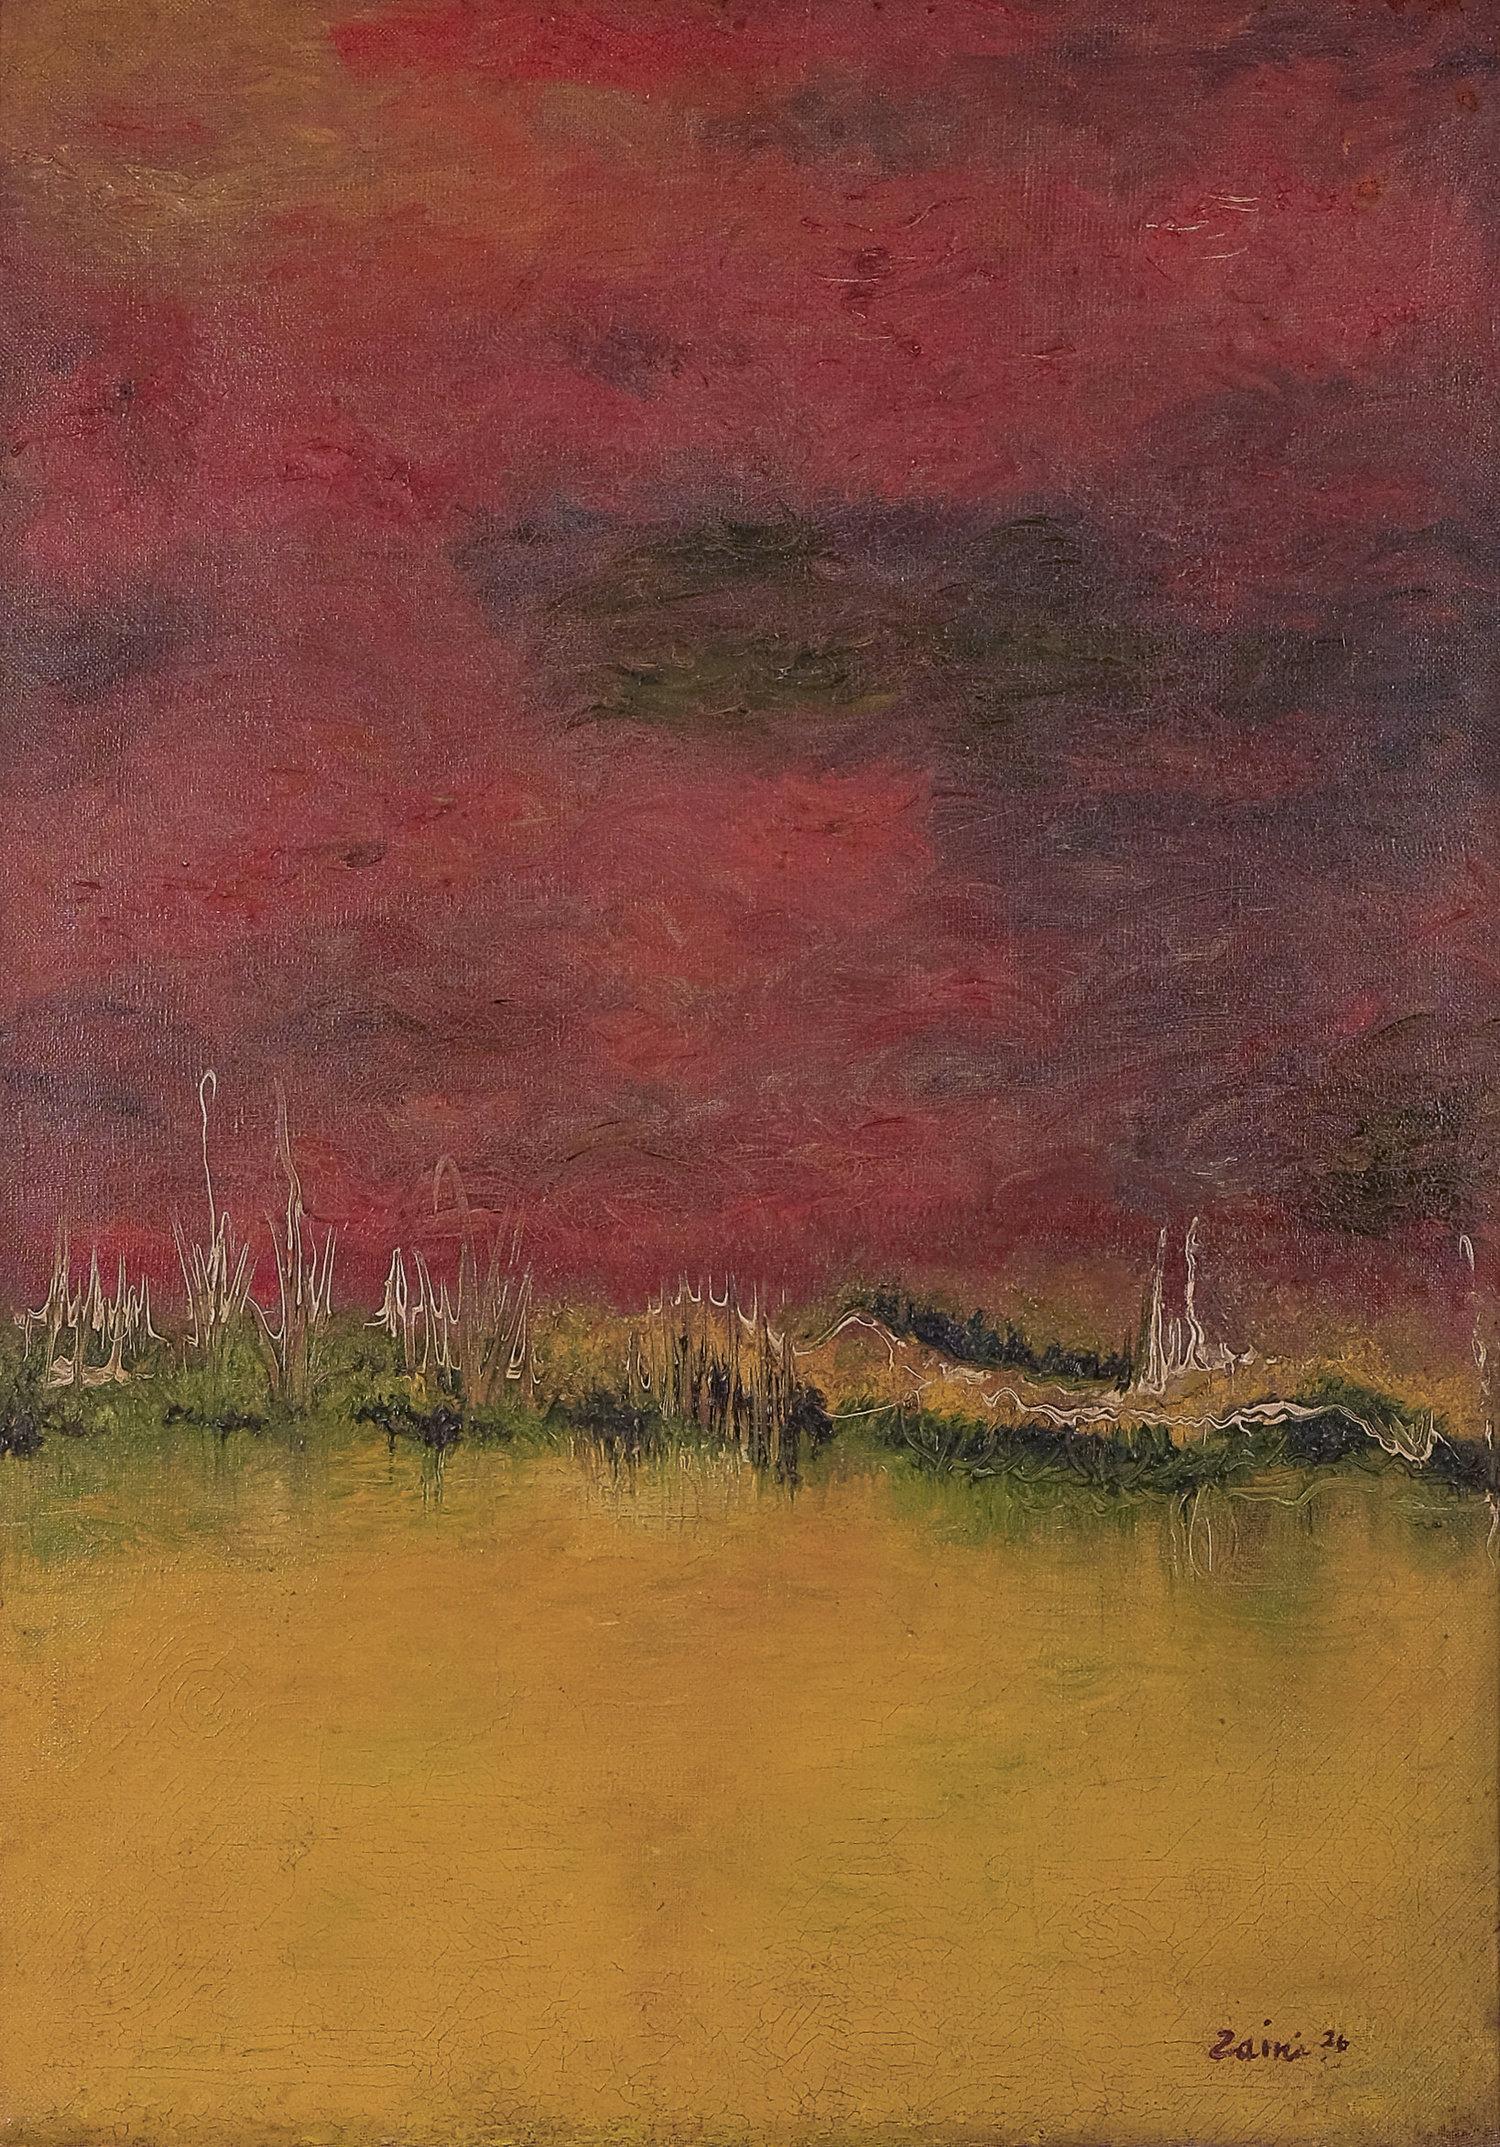 Zaini, Langit Merah (Crimson Sky), oil on canvas, 70 x 50 cm, 1976